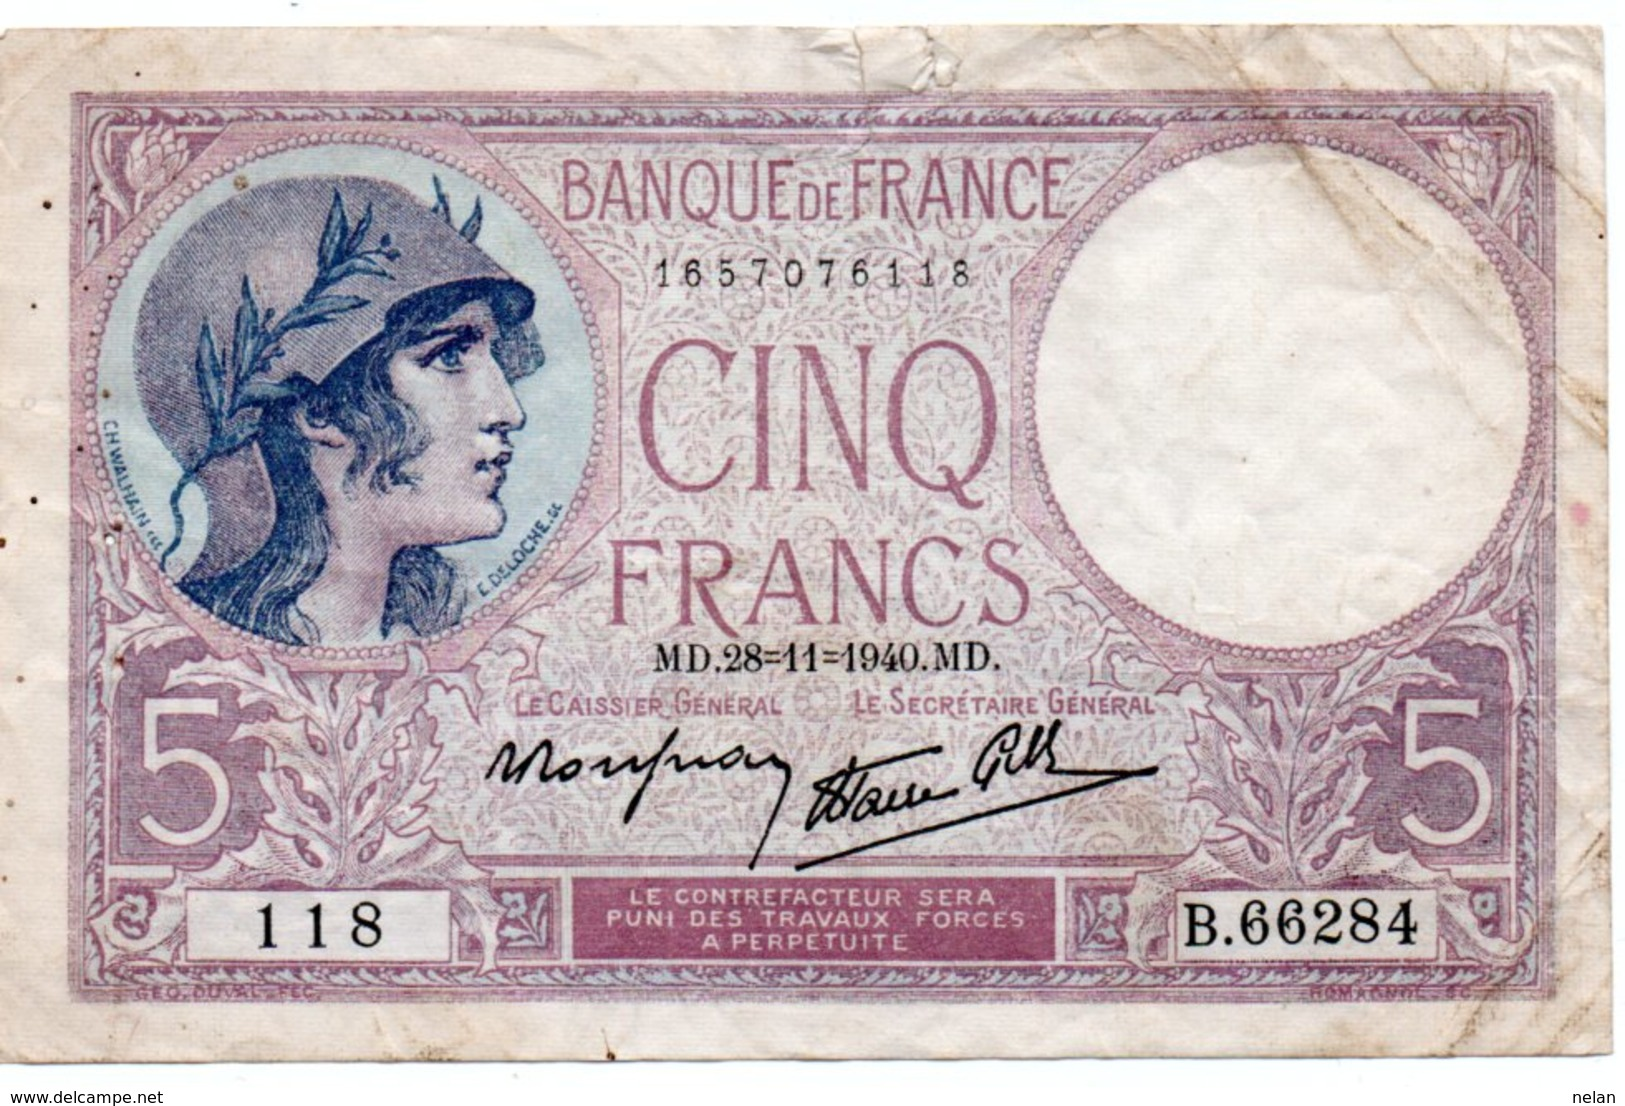 FRANCIA 5 FRANCS 1940  P-83a10 VG - 1871-1952 Antiguos Francos Circulantes En El XX Siglo